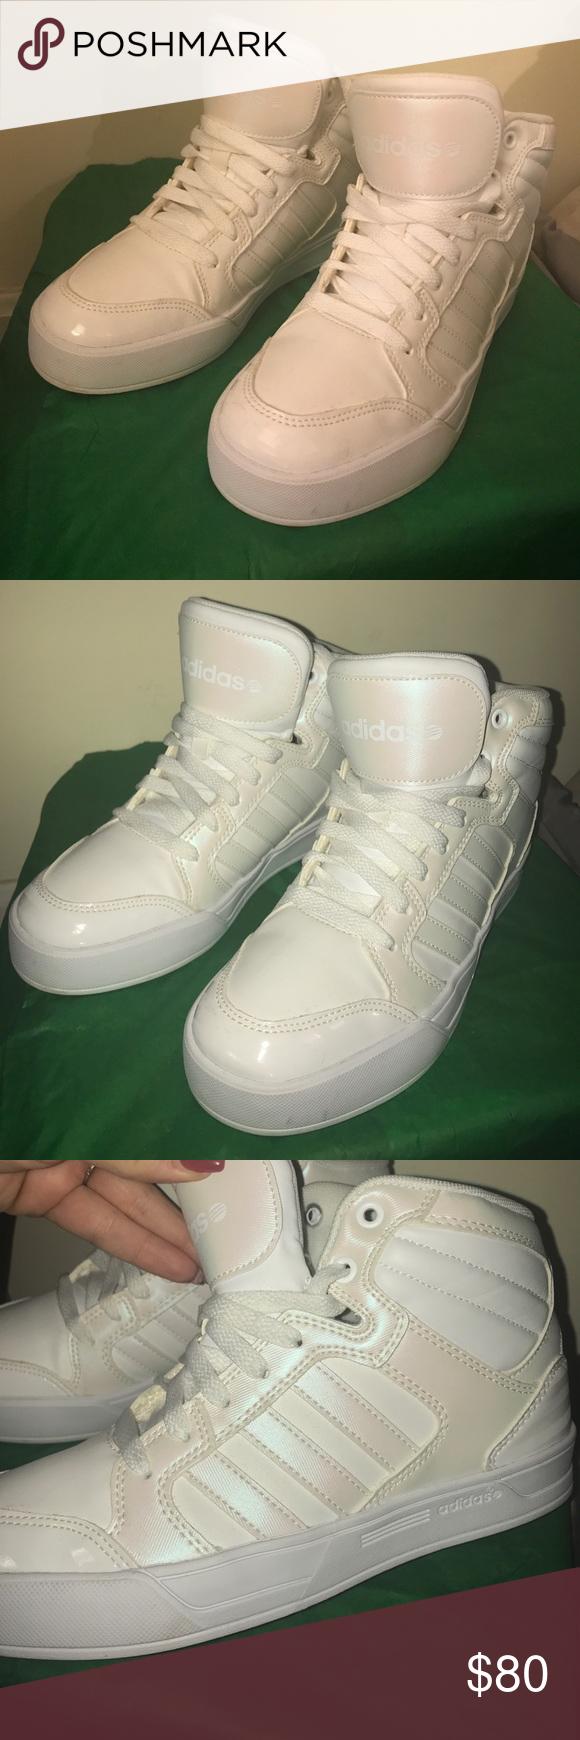 Adidas scarpe neo - etichetta appena indossato le adidas, adidas e